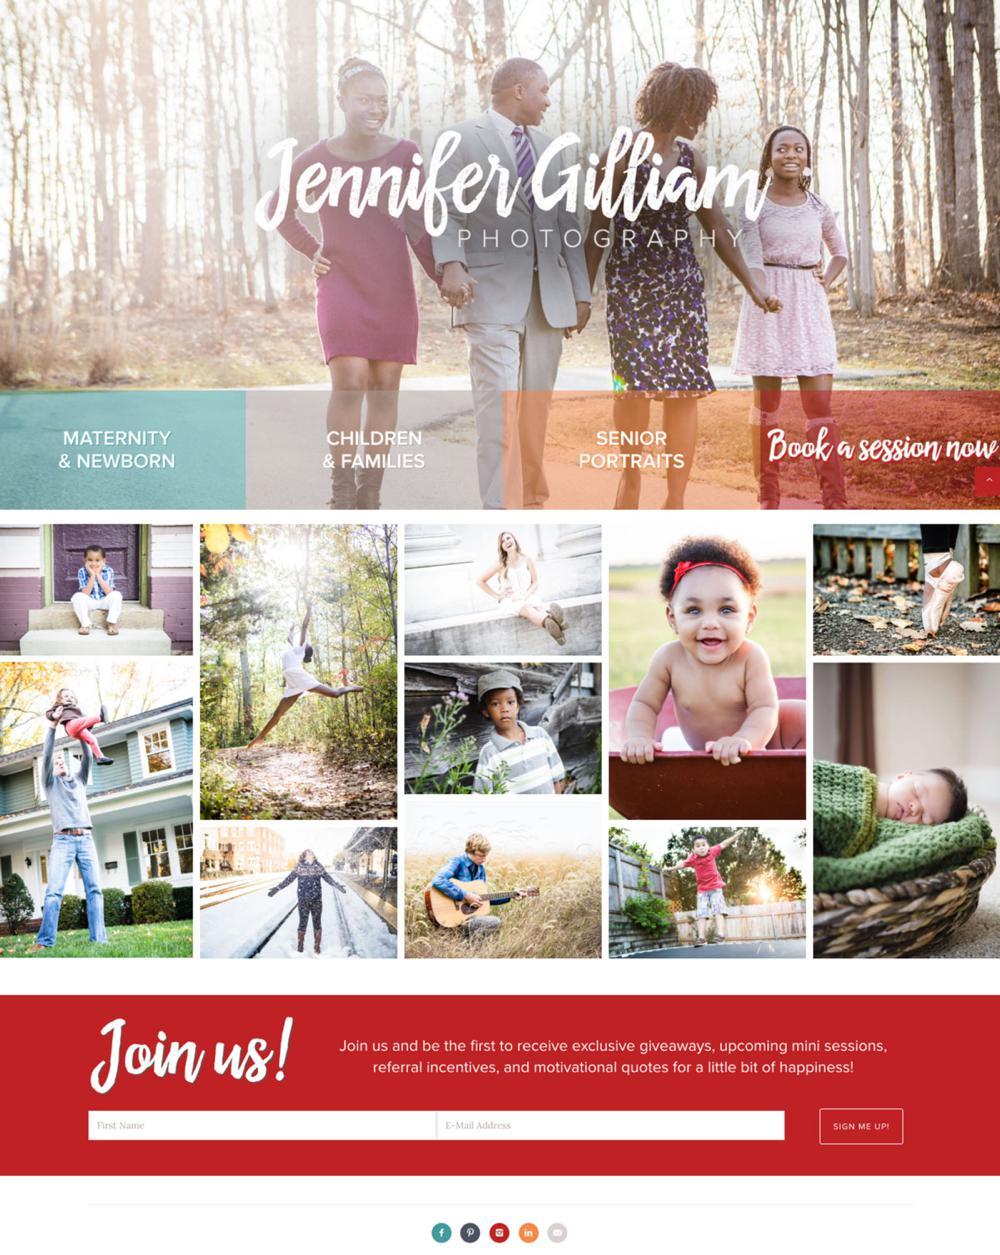 Jennifer-Gilliam-Custom-WordPress-Web-Design-RKA-ink